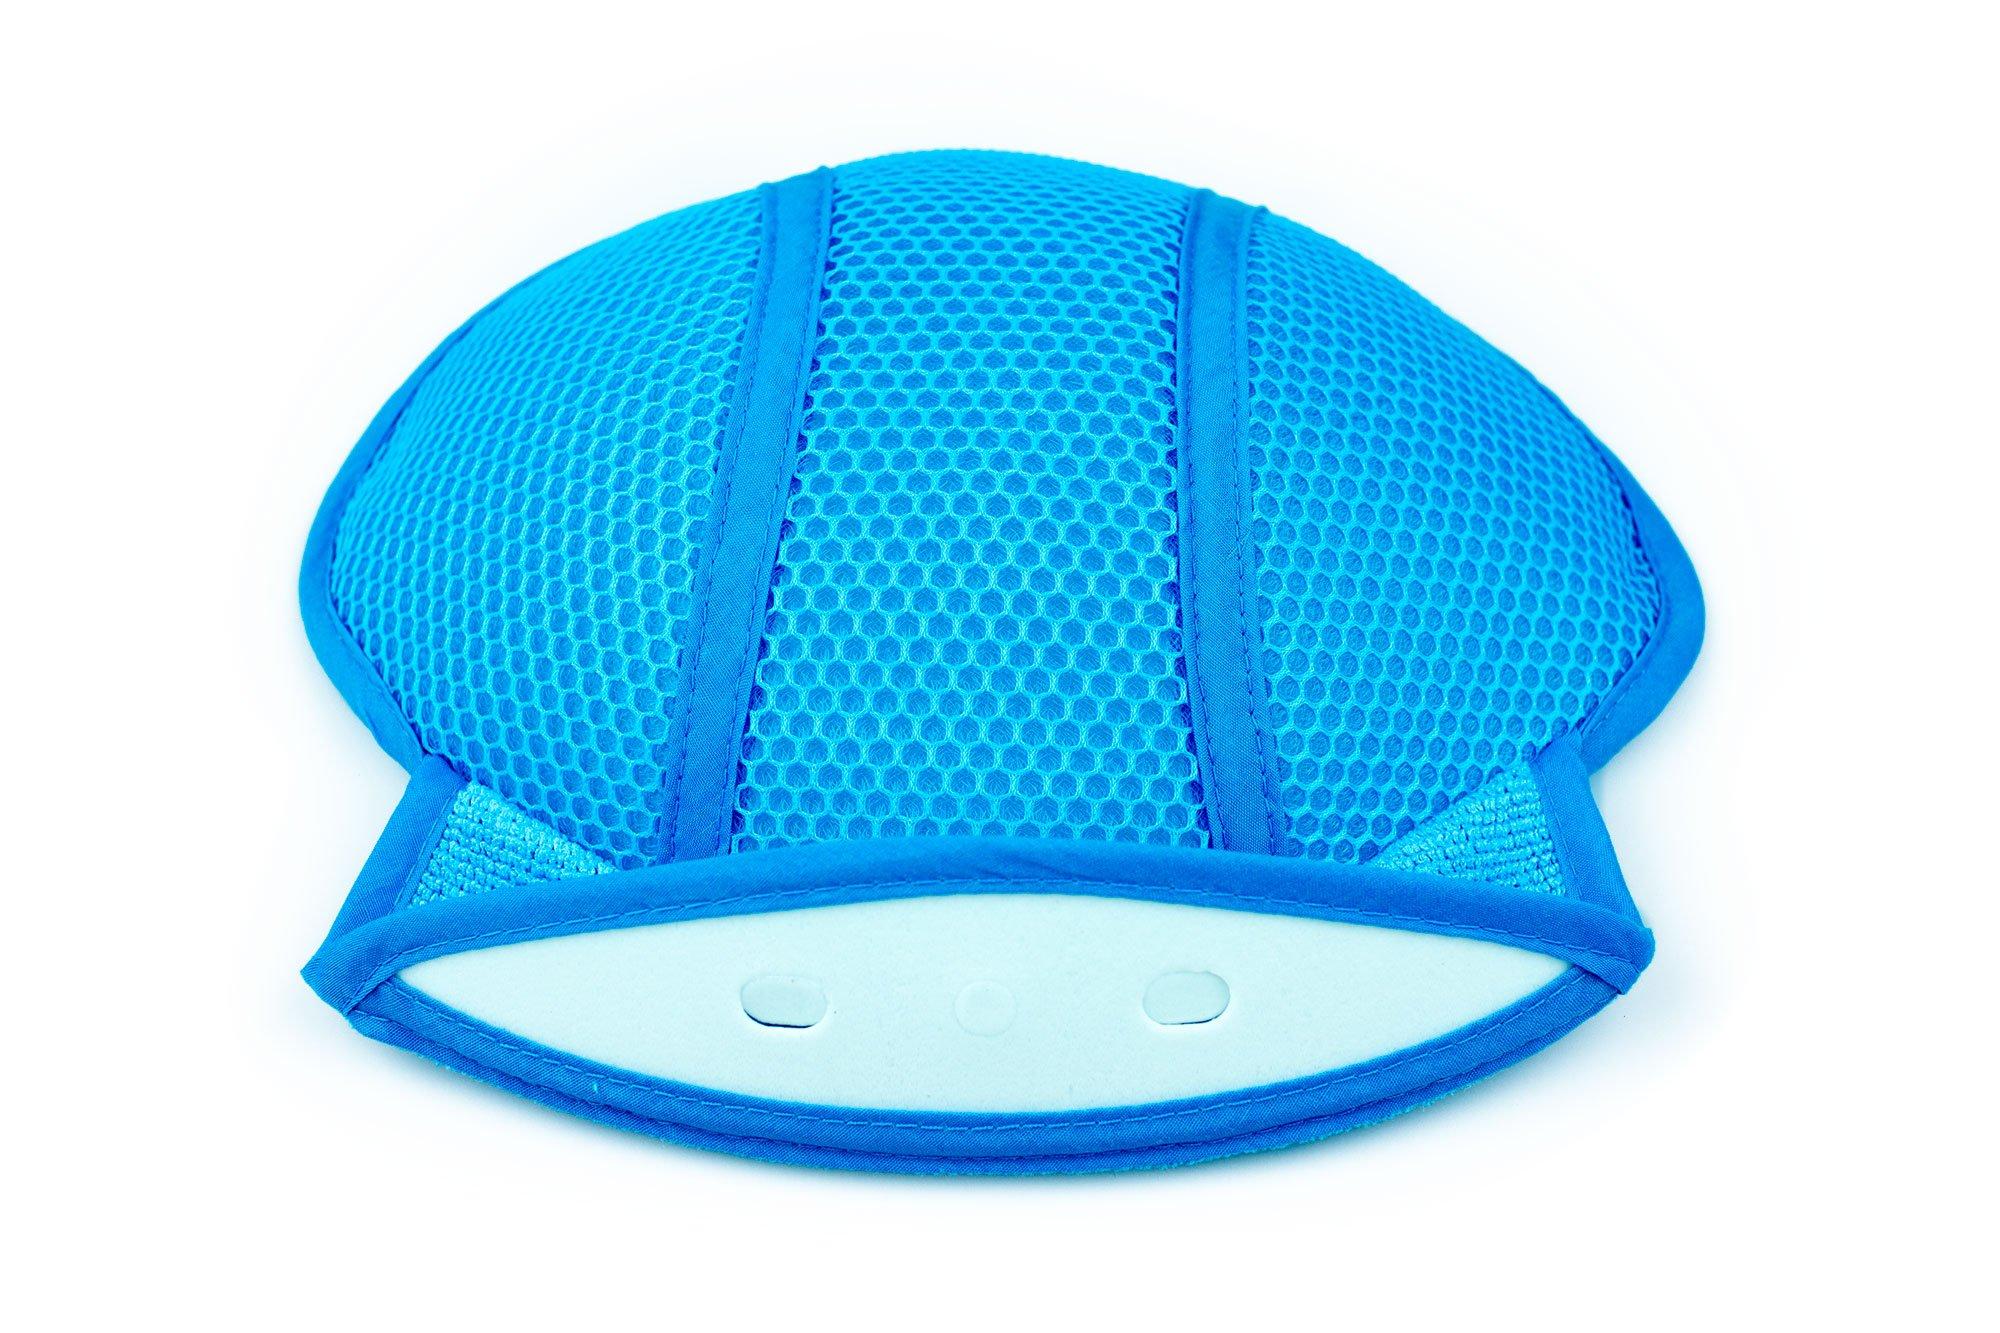 MegaTrue 3PCK Hard Hat 3D Air Mesh Insert Cooling Pad (Microfiber) by Cooling gear (Image #3)